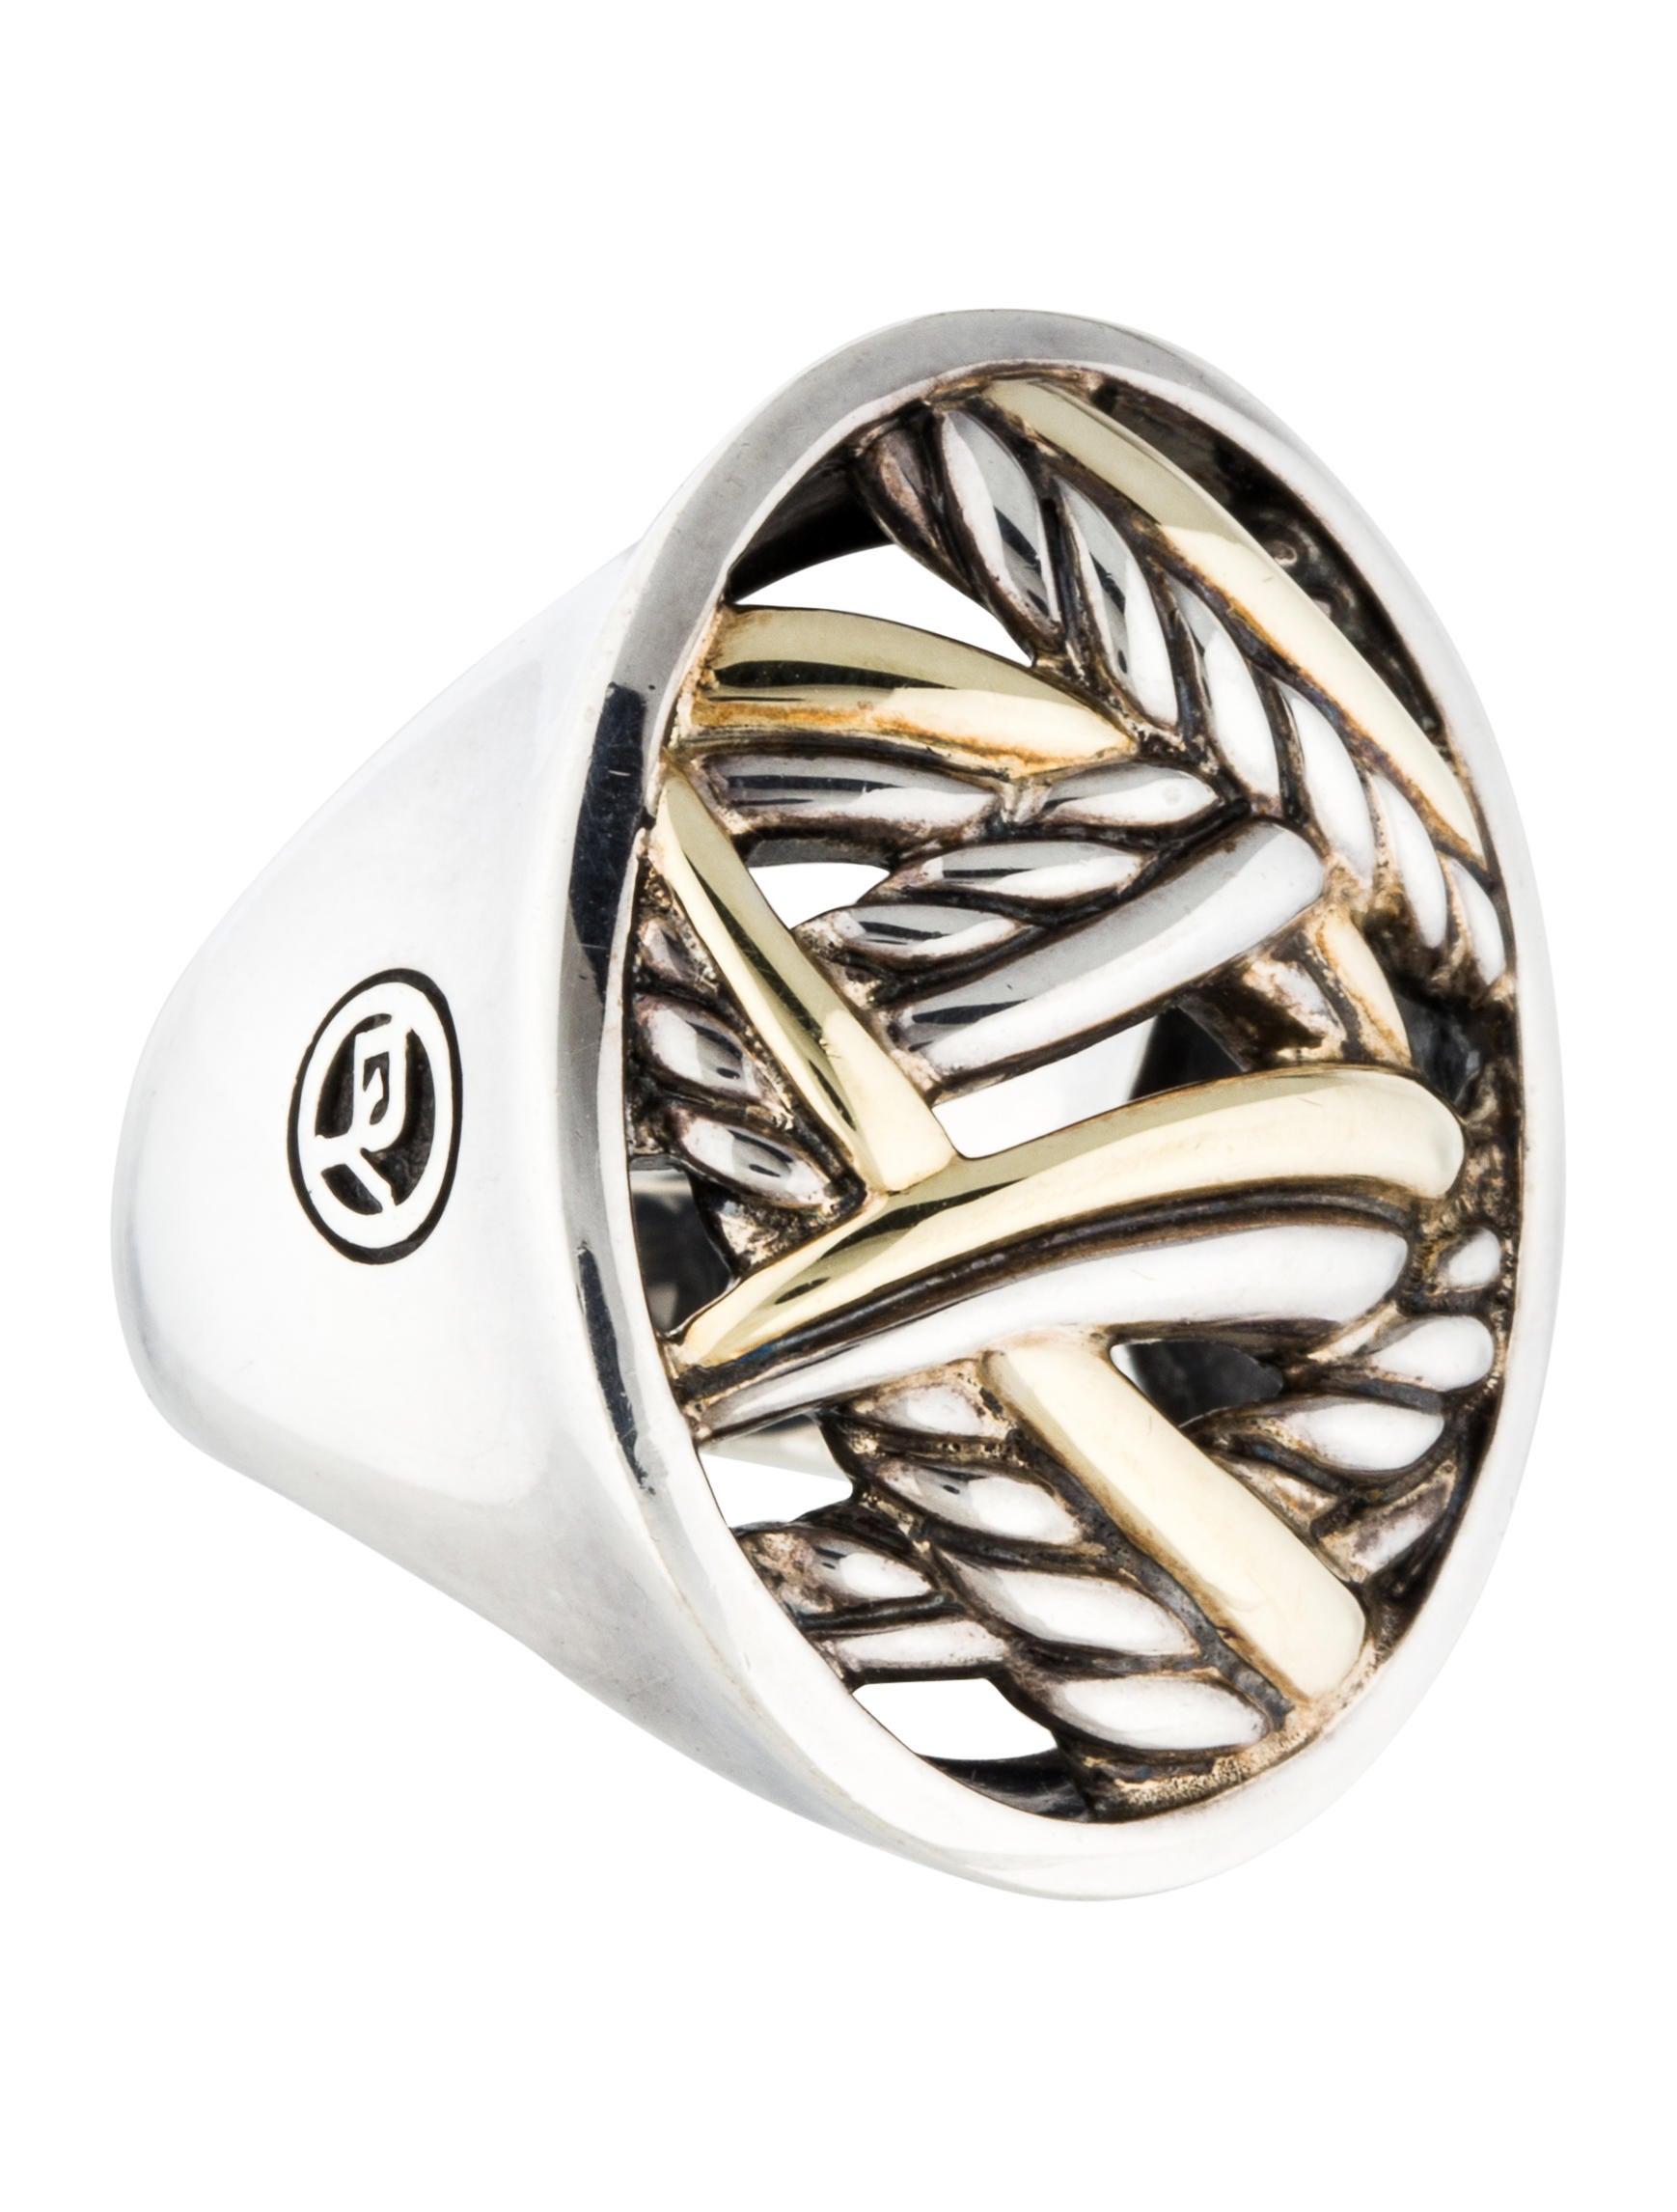 David yurman papyrus ring rings dvy37563 the realreal for David yurman inspired jewelry rings